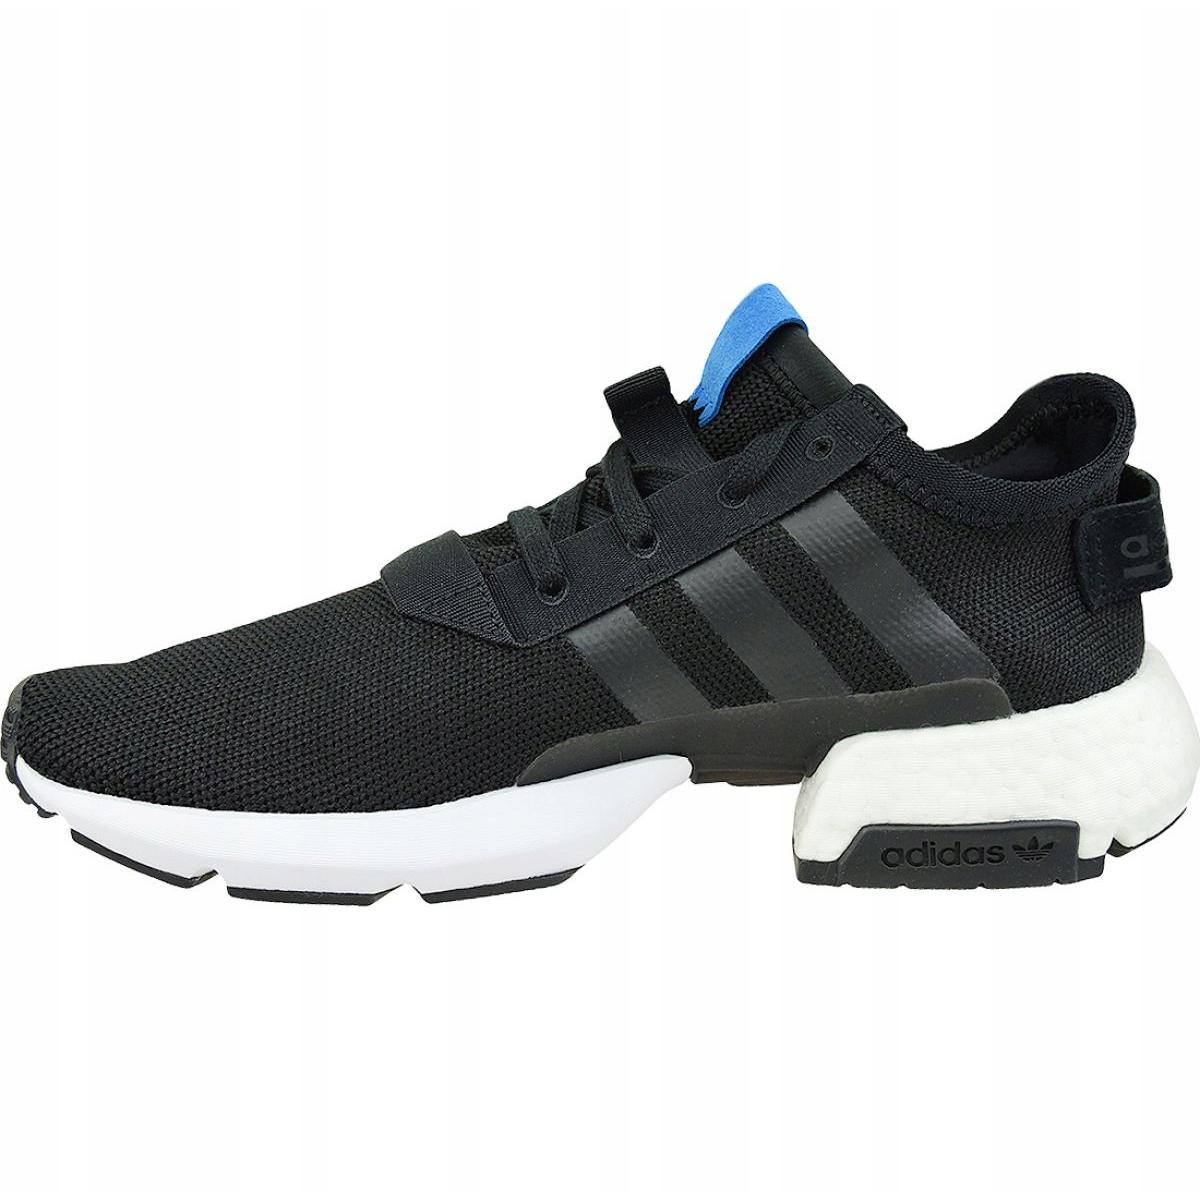 Adidas POD S3.1 Női Olcsón Online Adidas Originals Cipő